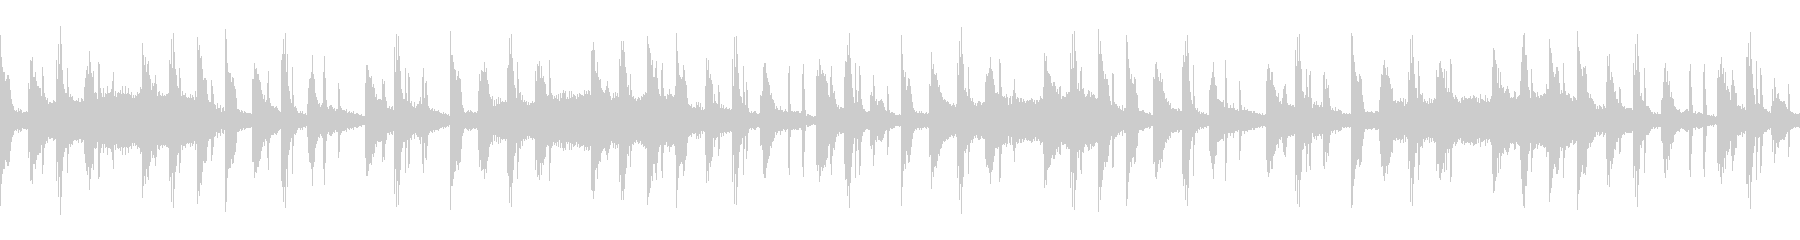 8-bar loop version pattern B's unreproduced waveform